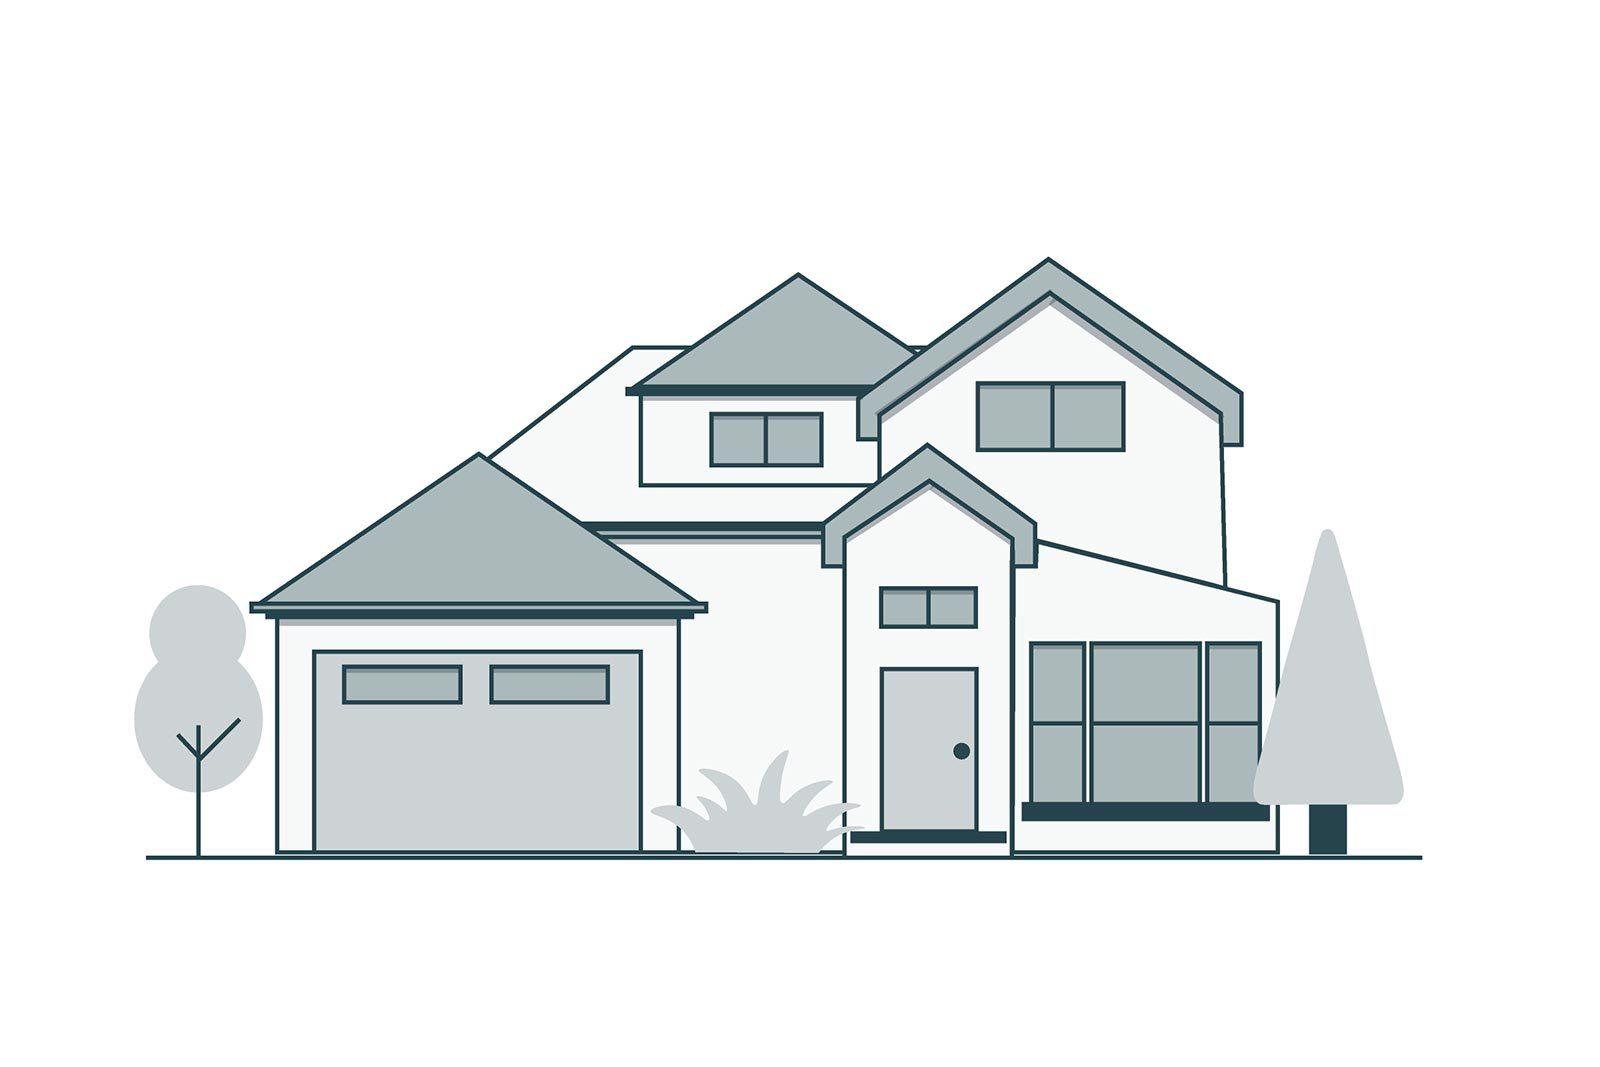 1162 Henry Long Blvd Stockton, CA 95206